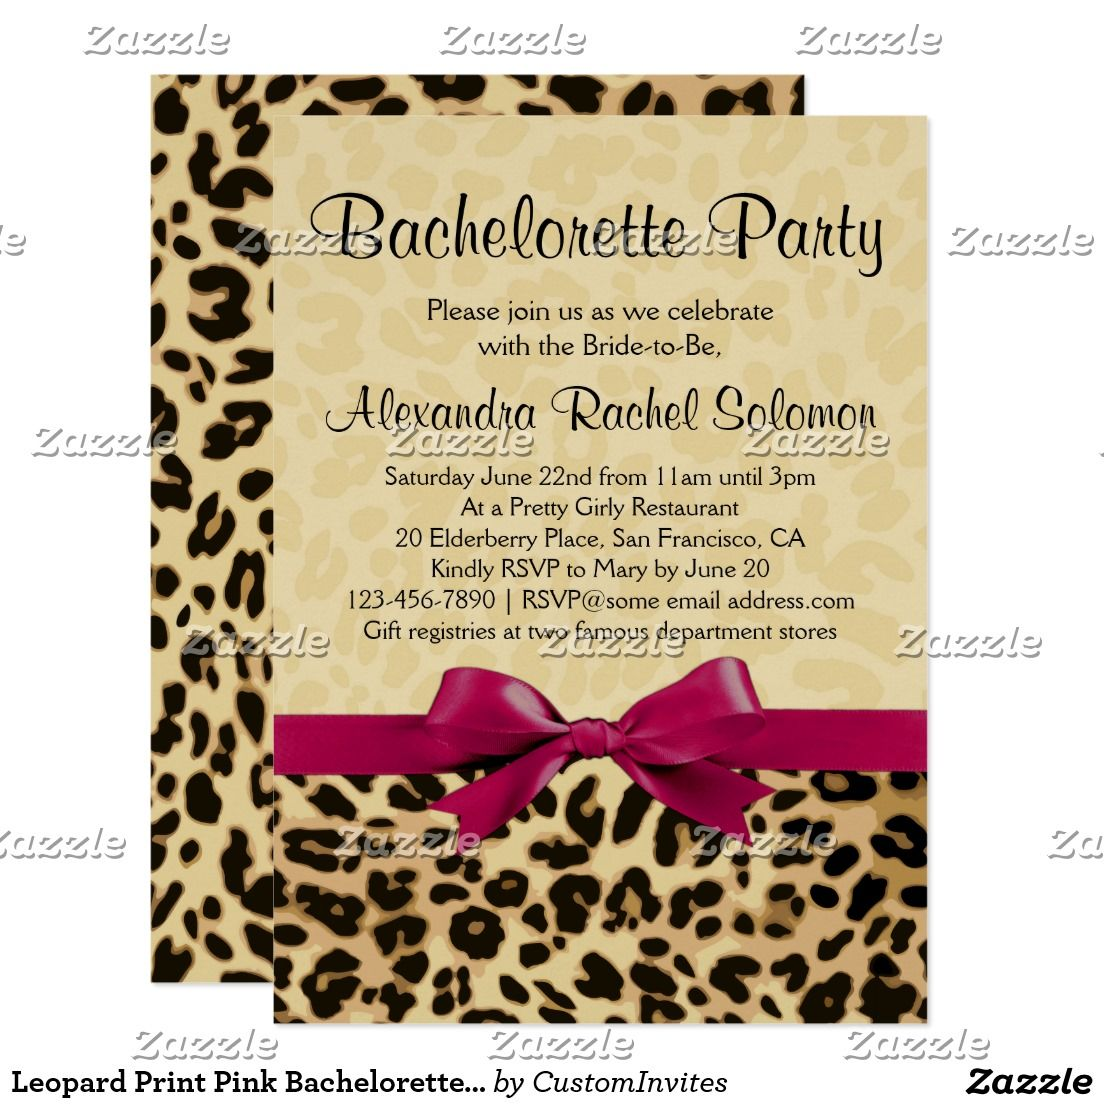 Leopard Print Pink Bachelorette Party Invitation | Pink bachelorette ...